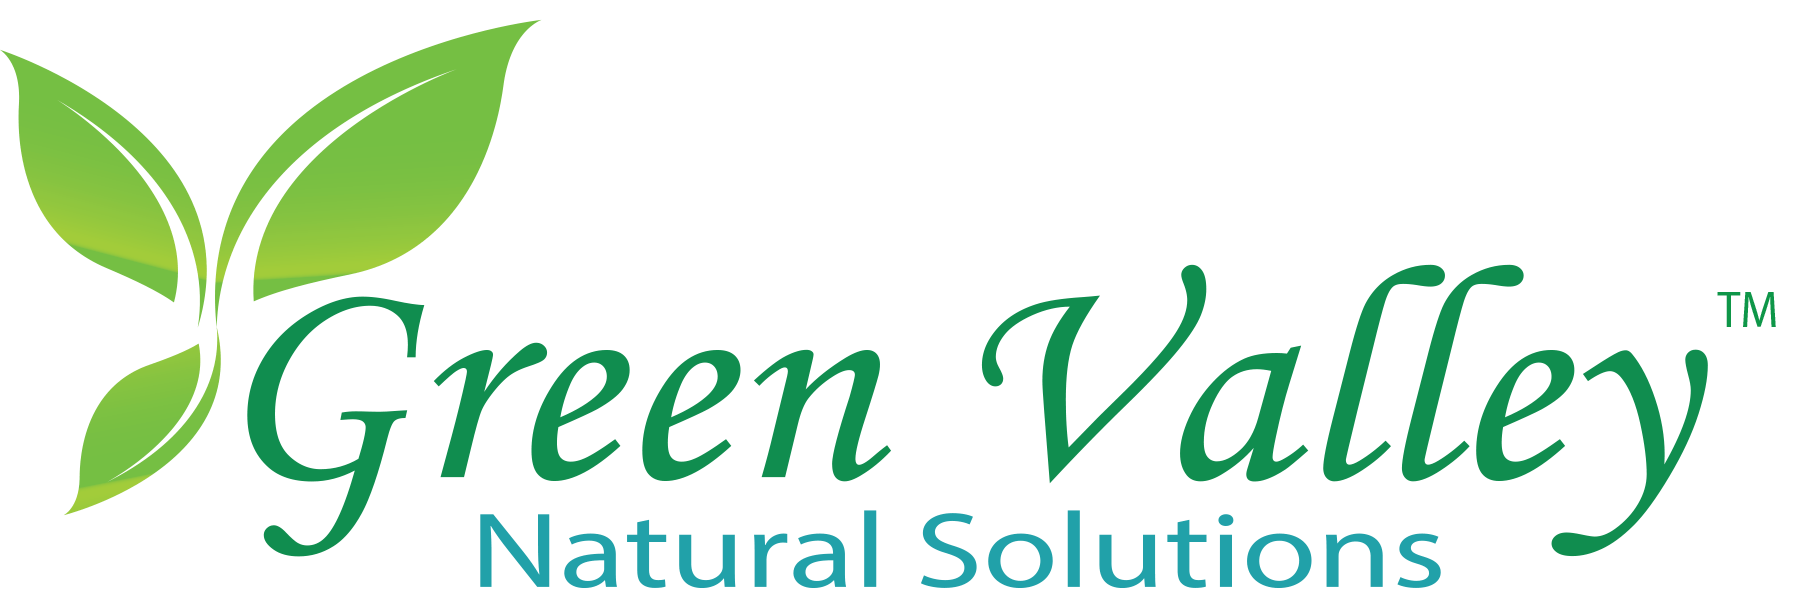 Green Valley Natural Solutions Retina Logo